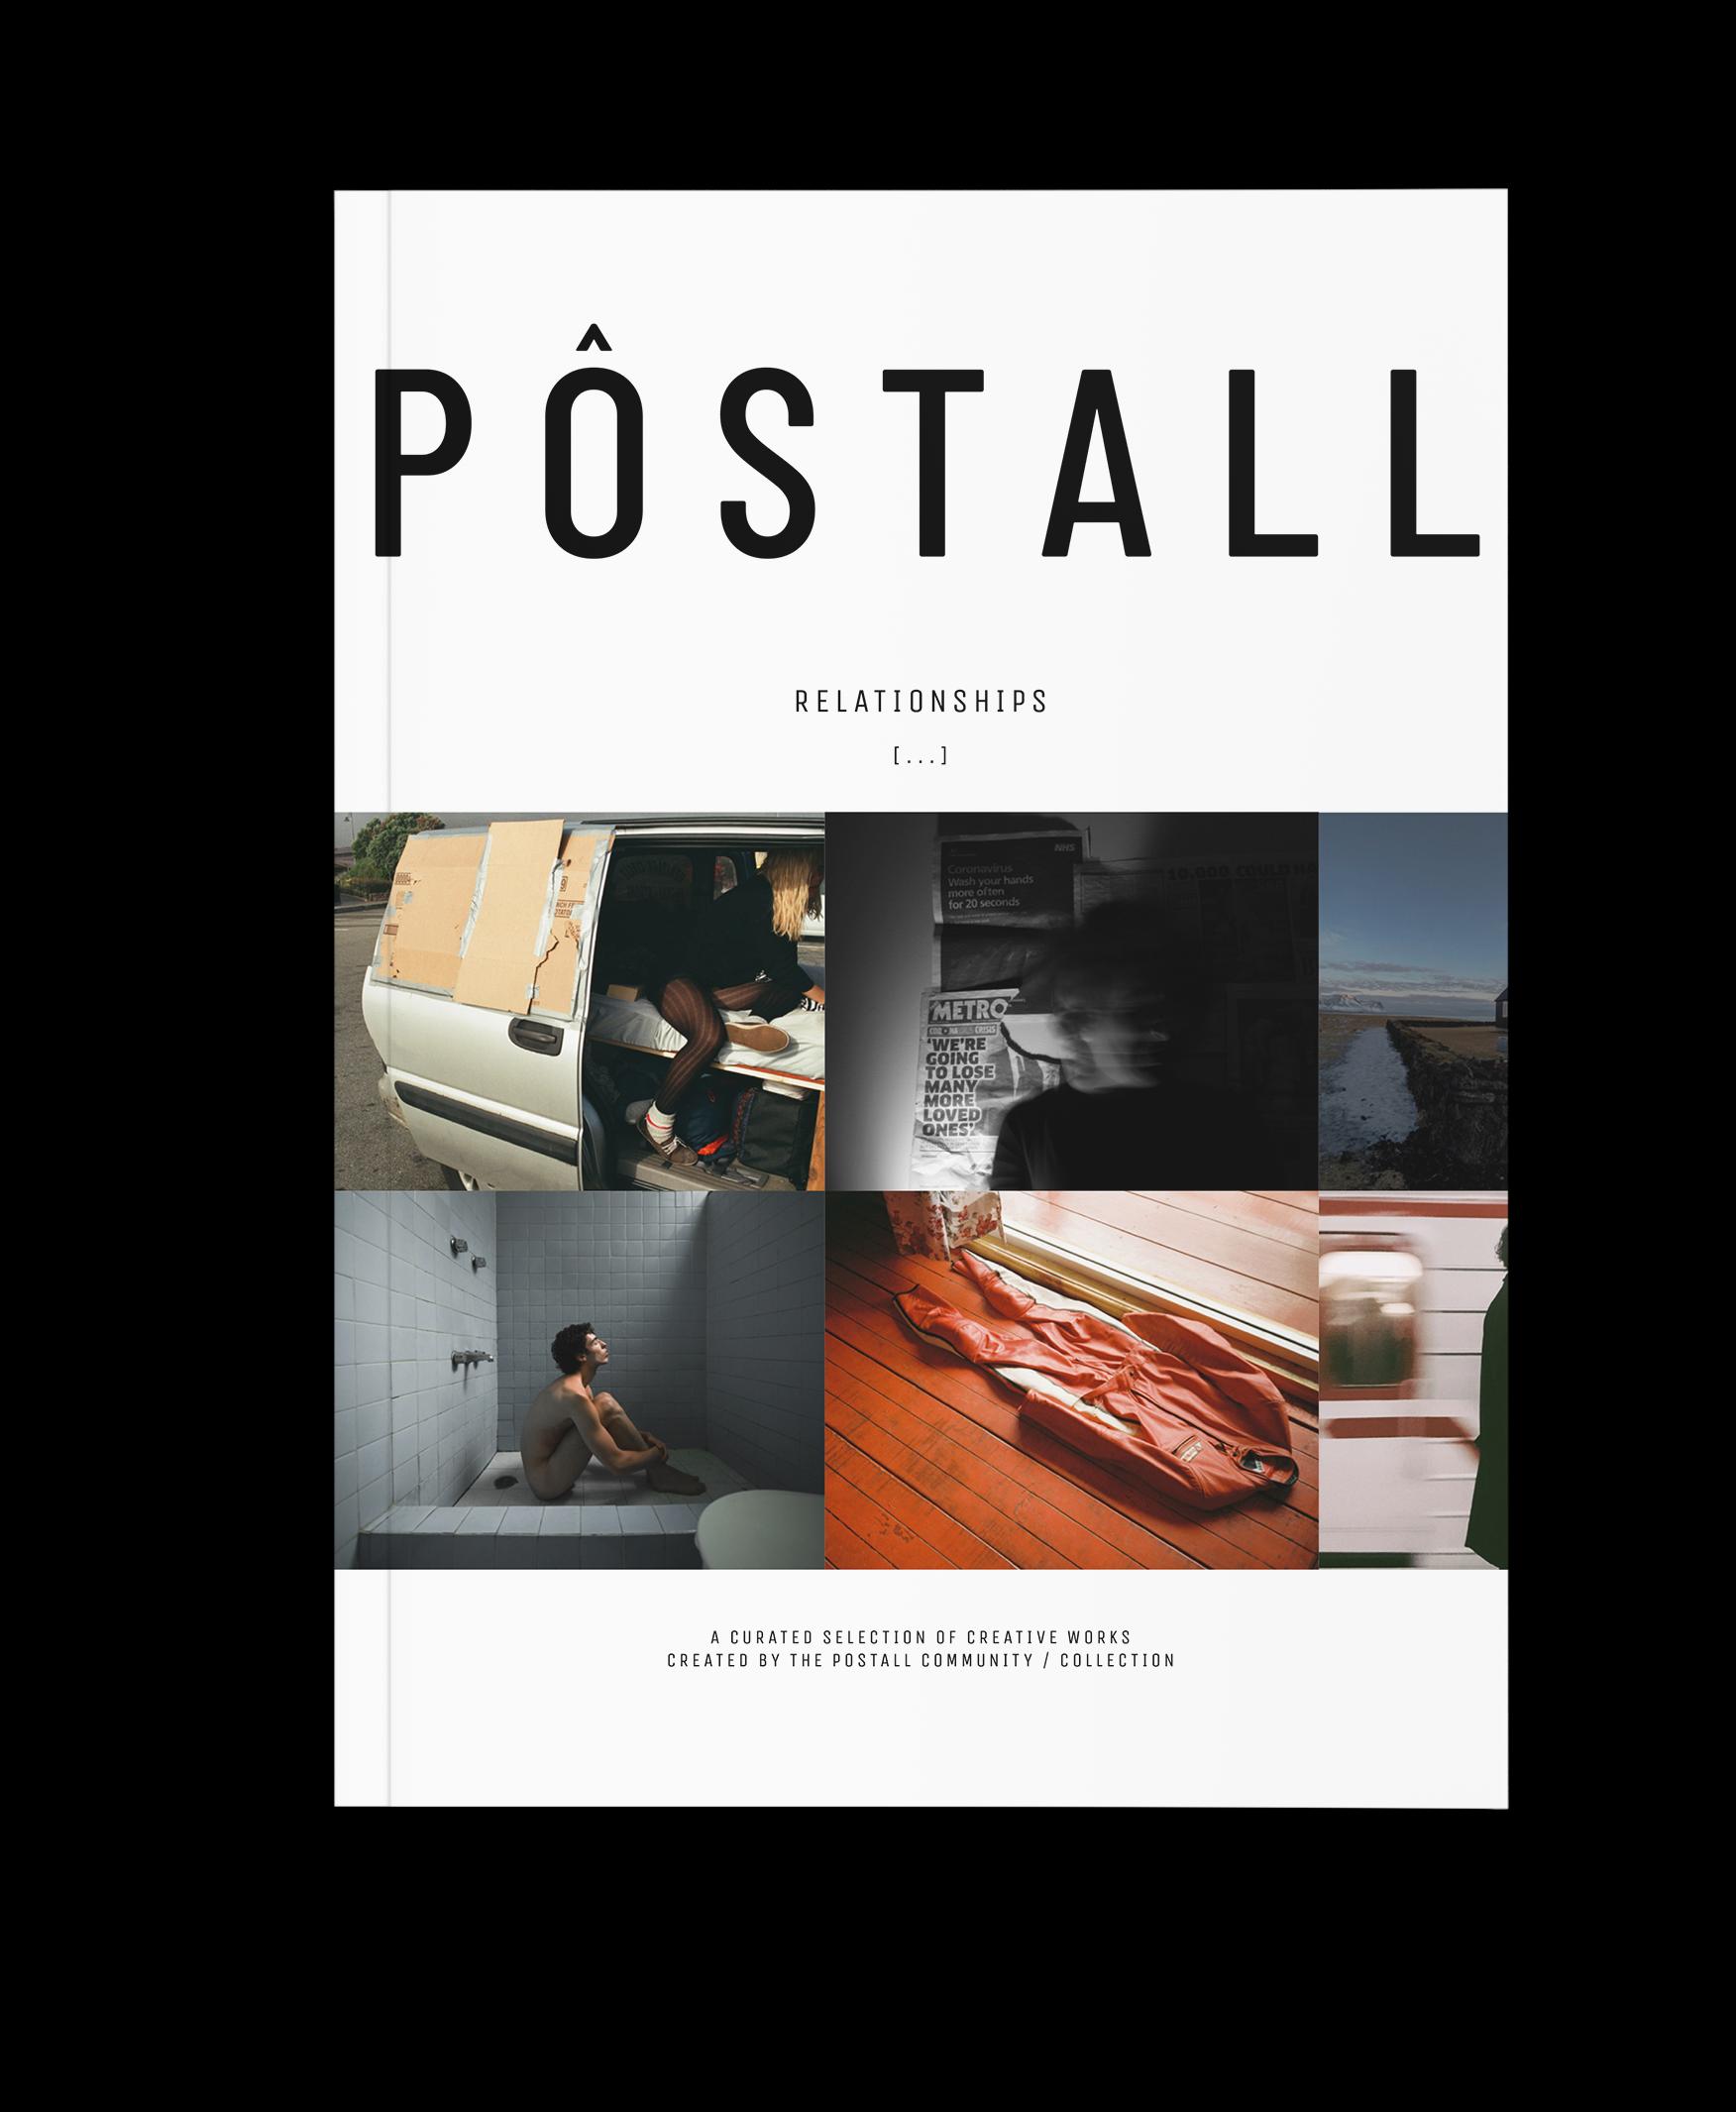 Postall magazine cover